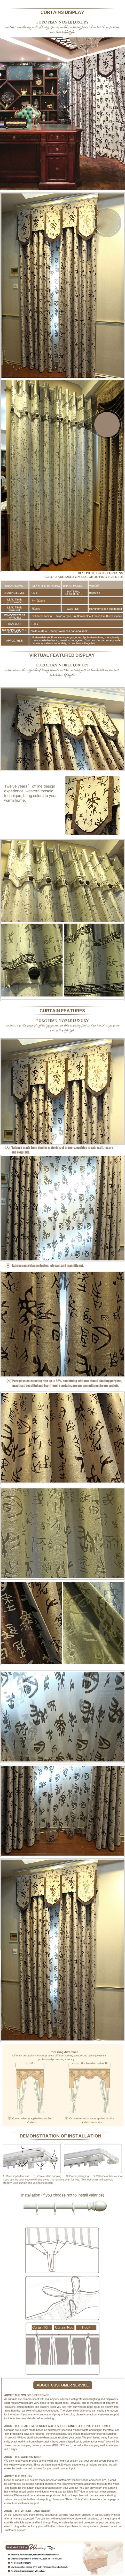 luxury window curtain - Impression of China $81  (65% off)